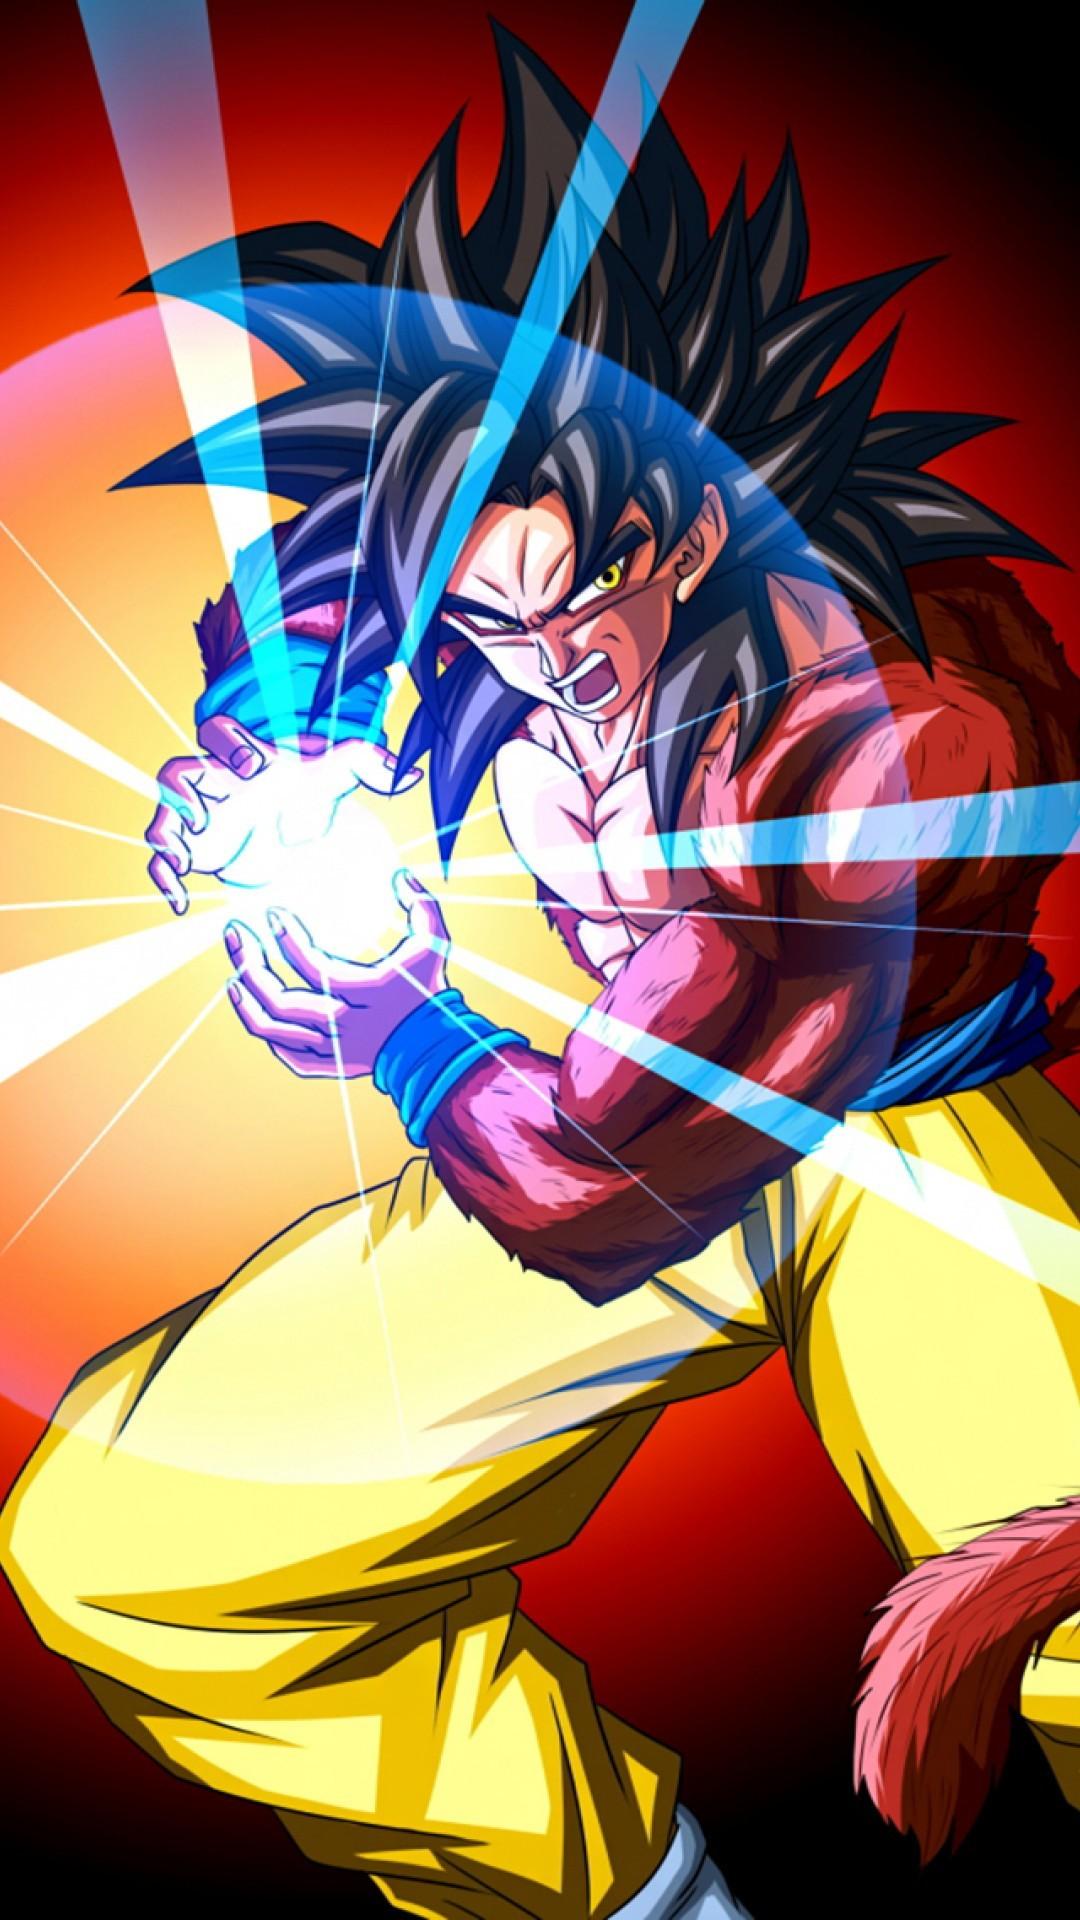 Res: 1080x1920, Goku Super Saiyan 4 iPhone 6 Wallpaper Super Saiyan 4 son Goku iPhone 6  Plus Wallpaper